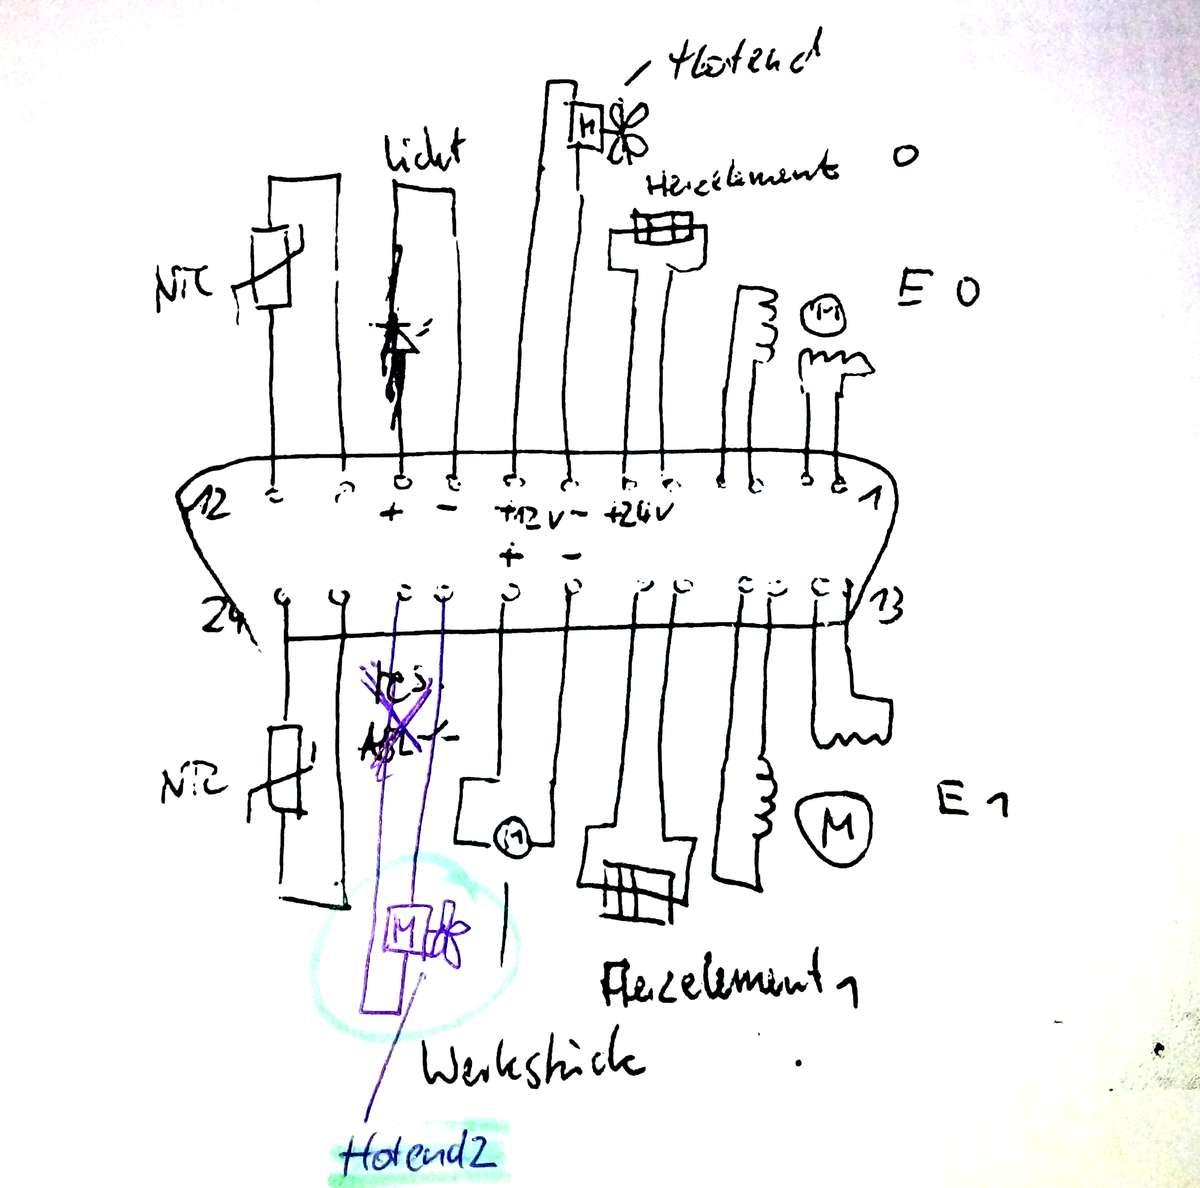 dual extruder und gesteuerte l u00fcfter am ramps 1 4 mit repetier firmware  1